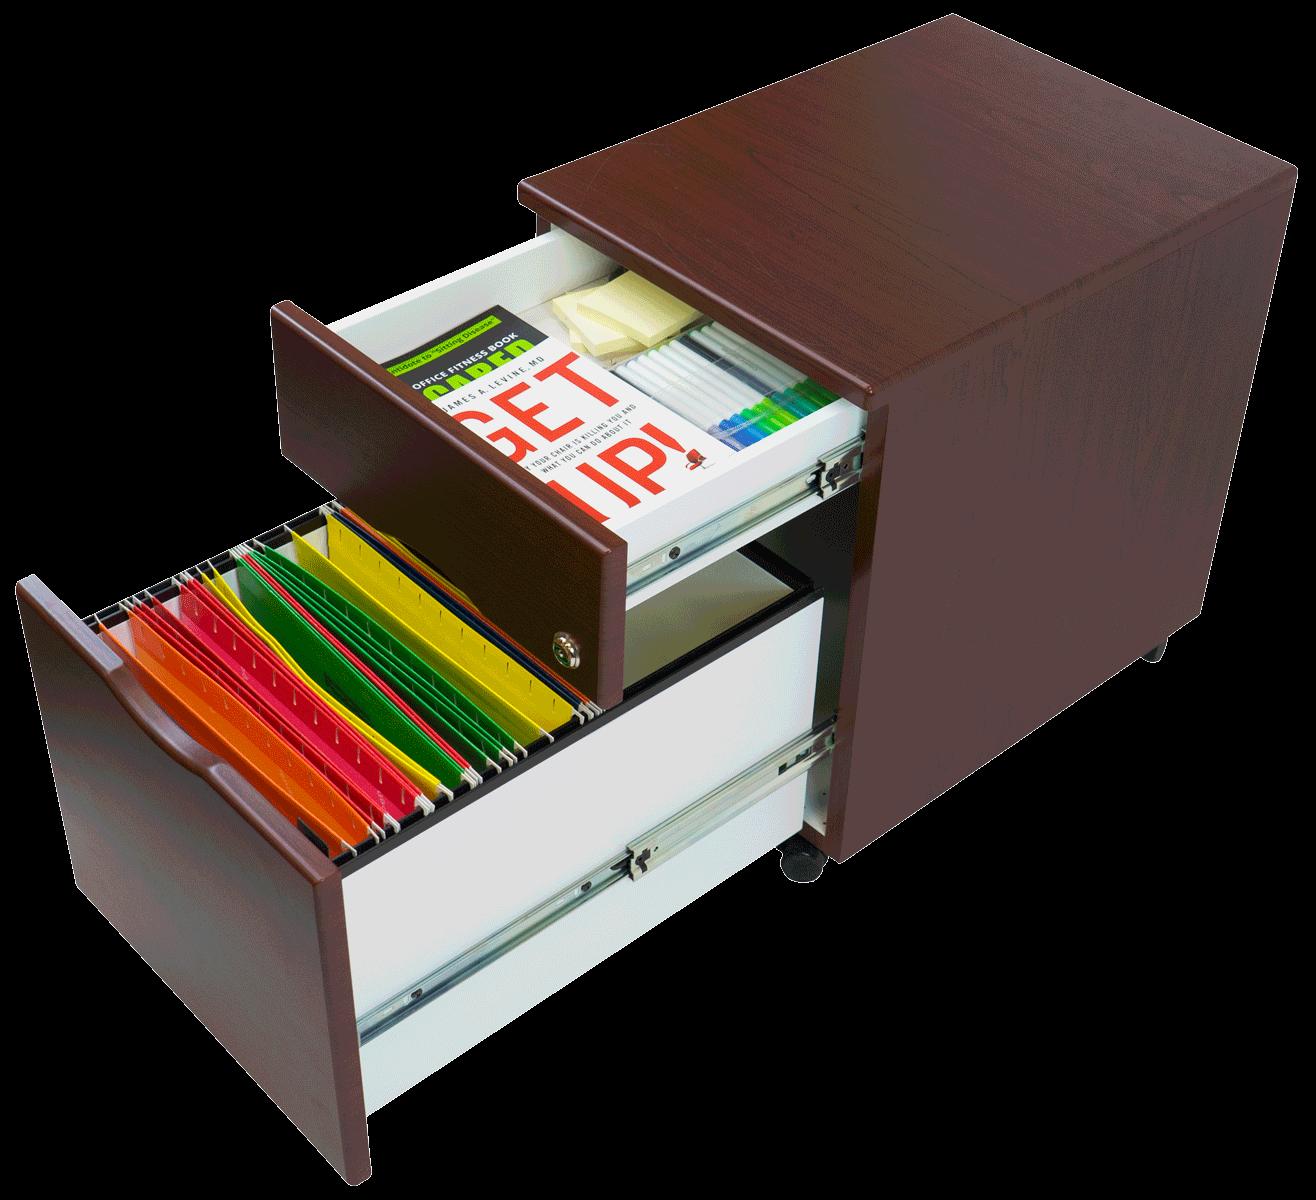 iMovR Mobile File Cabinet